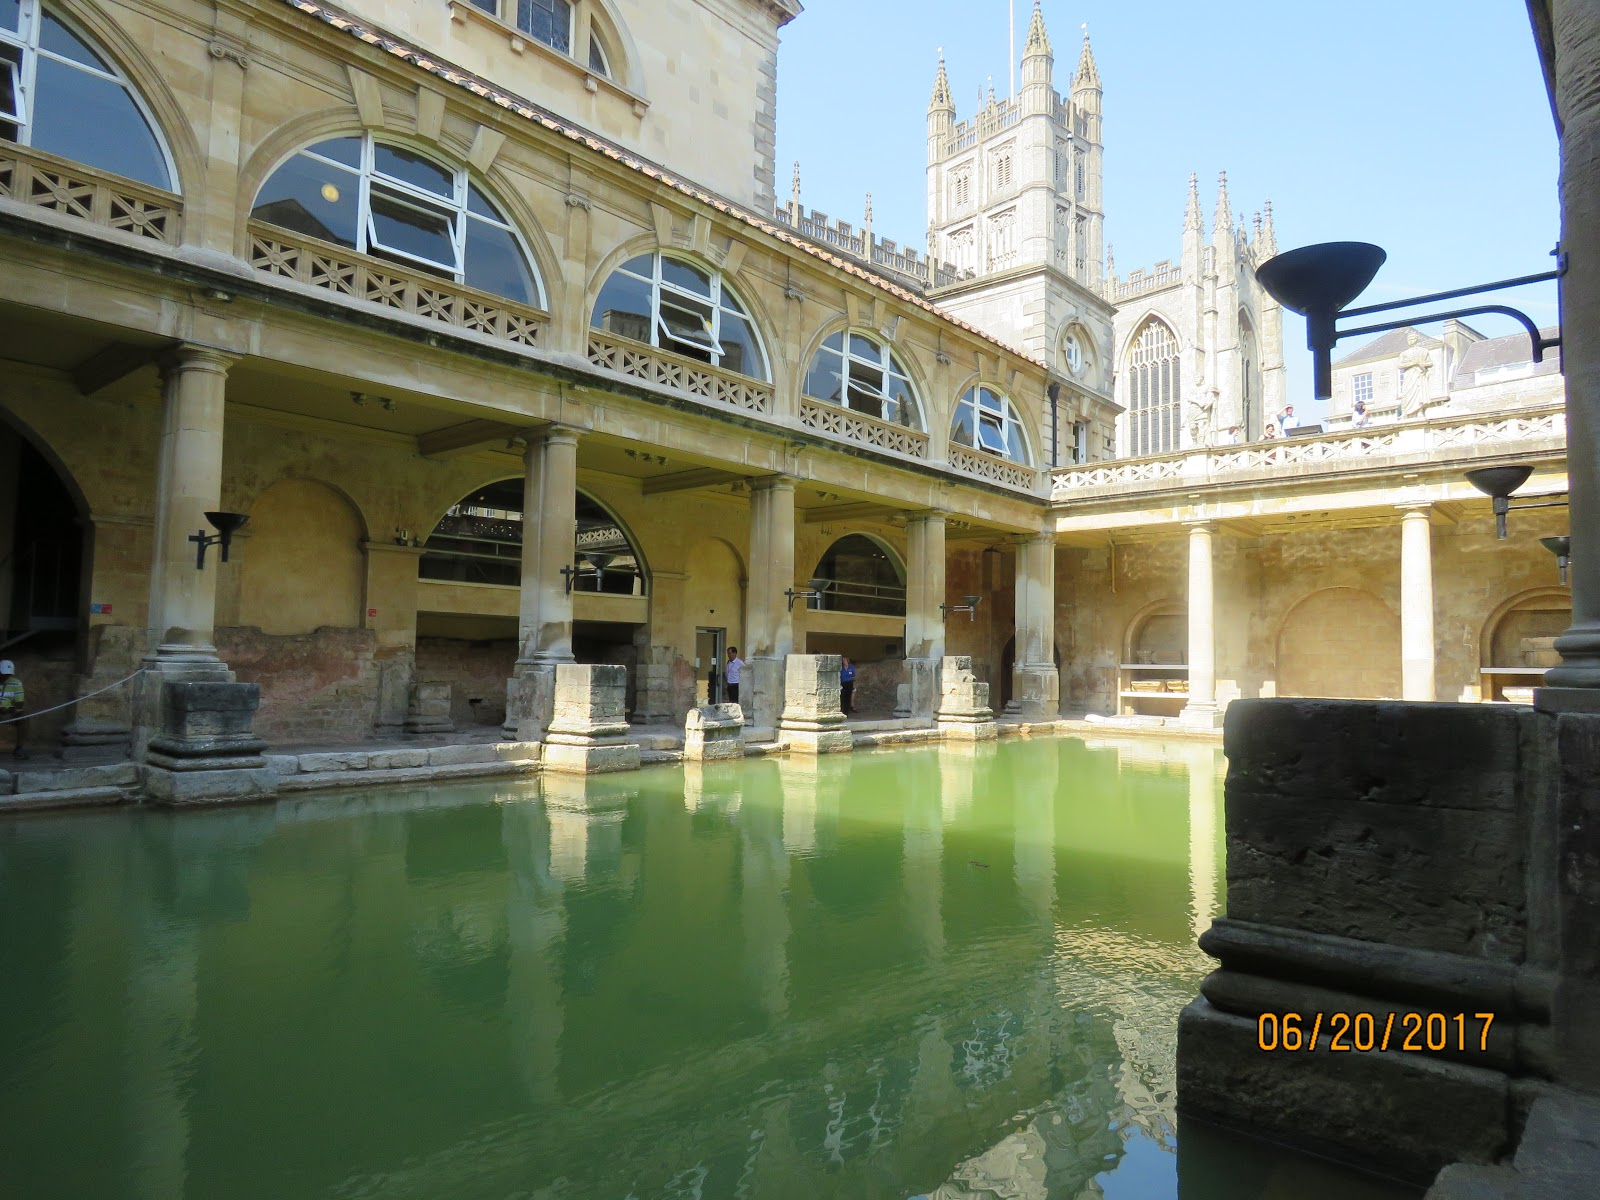 Historical Hussies: Bath, England, through the eyes of Regency ...